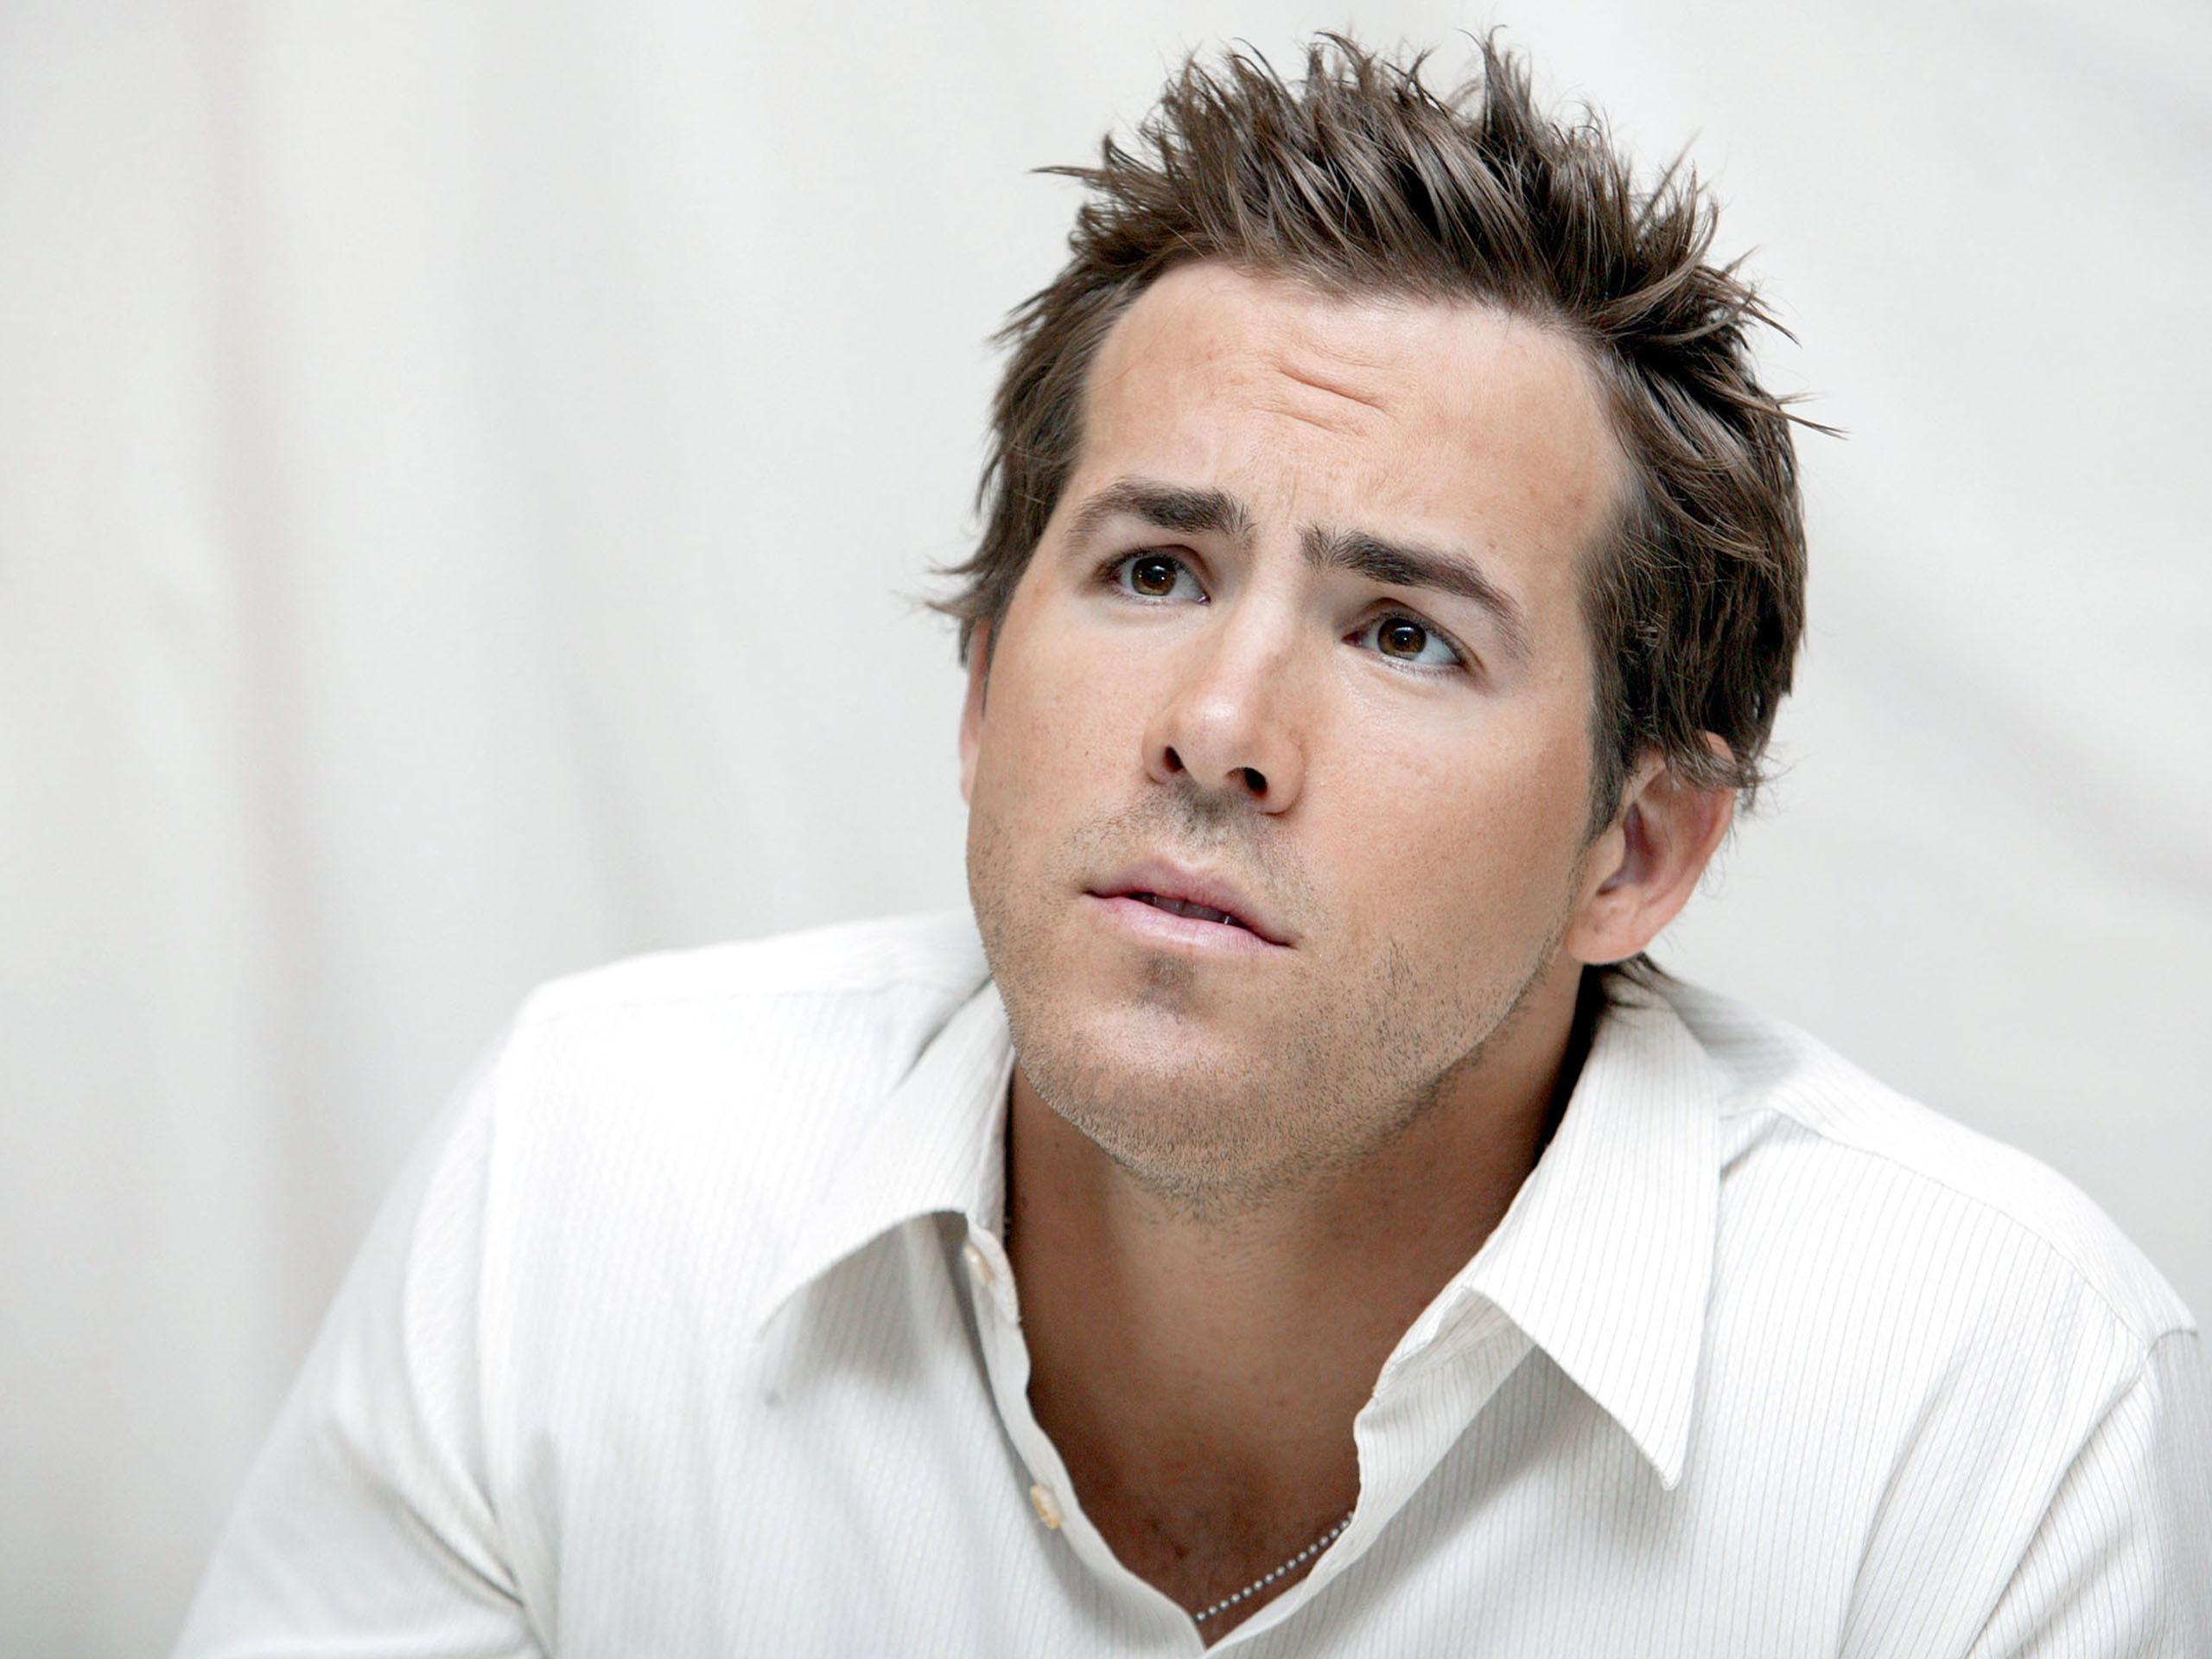 Ryan Reynolds HD